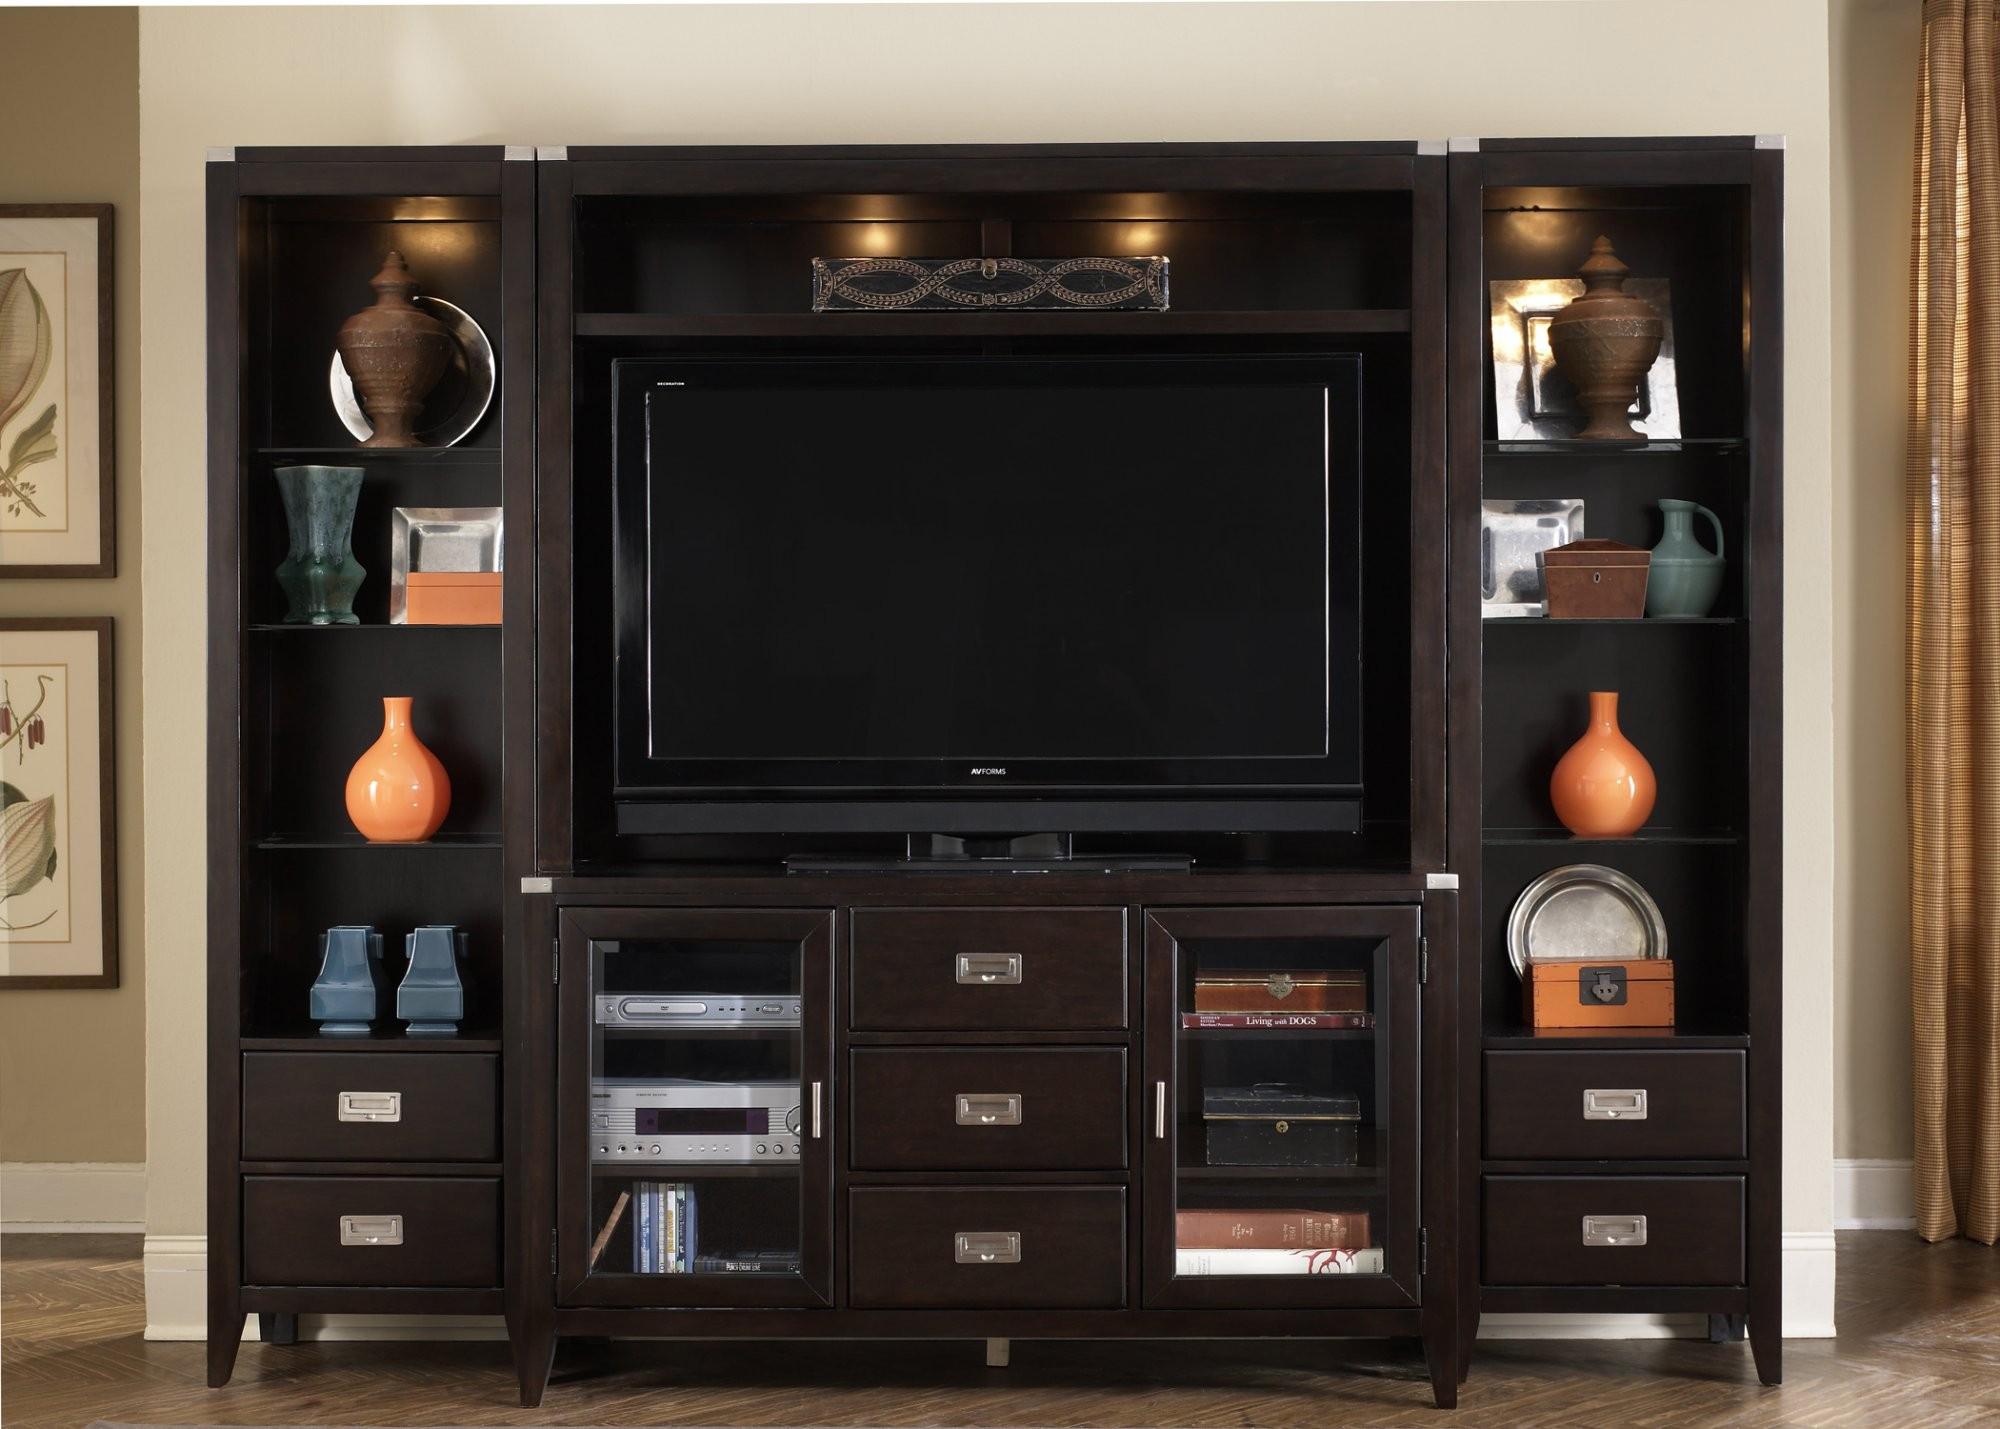 мебель, телевизор, шкафчики